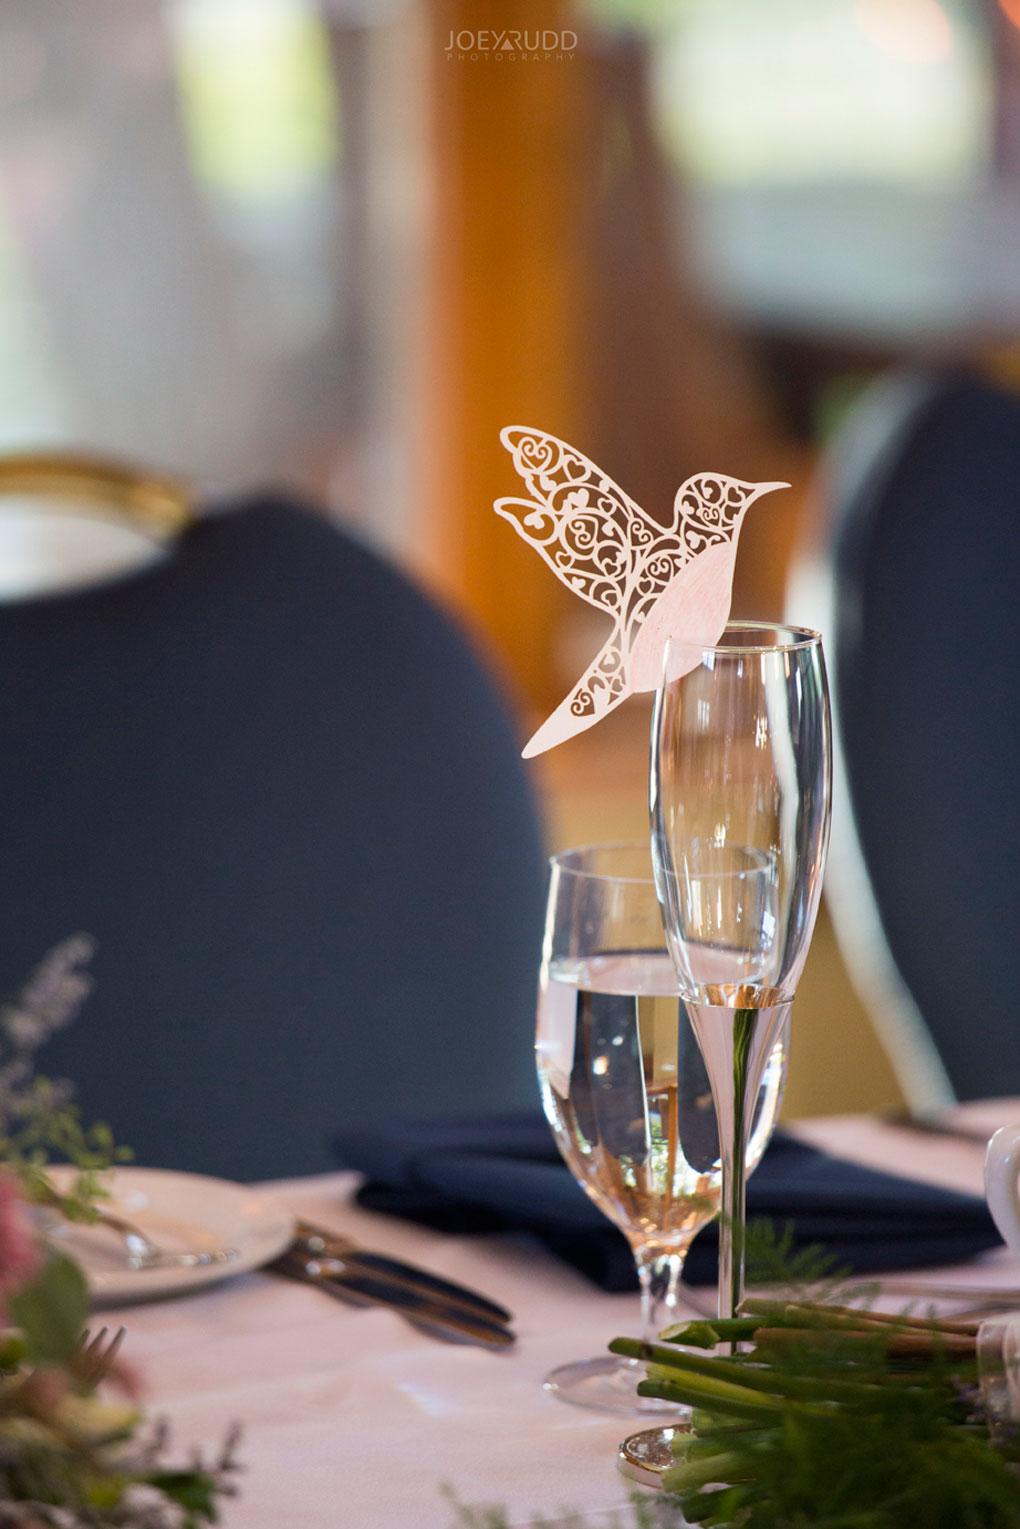 Marshes Wedding, Marshes Golf Club, Ottawa, Ottawa Wedding, Ontario Wedding, Joey Rudd Photography, Wedding Photos, Bride and Groom, Reception Details